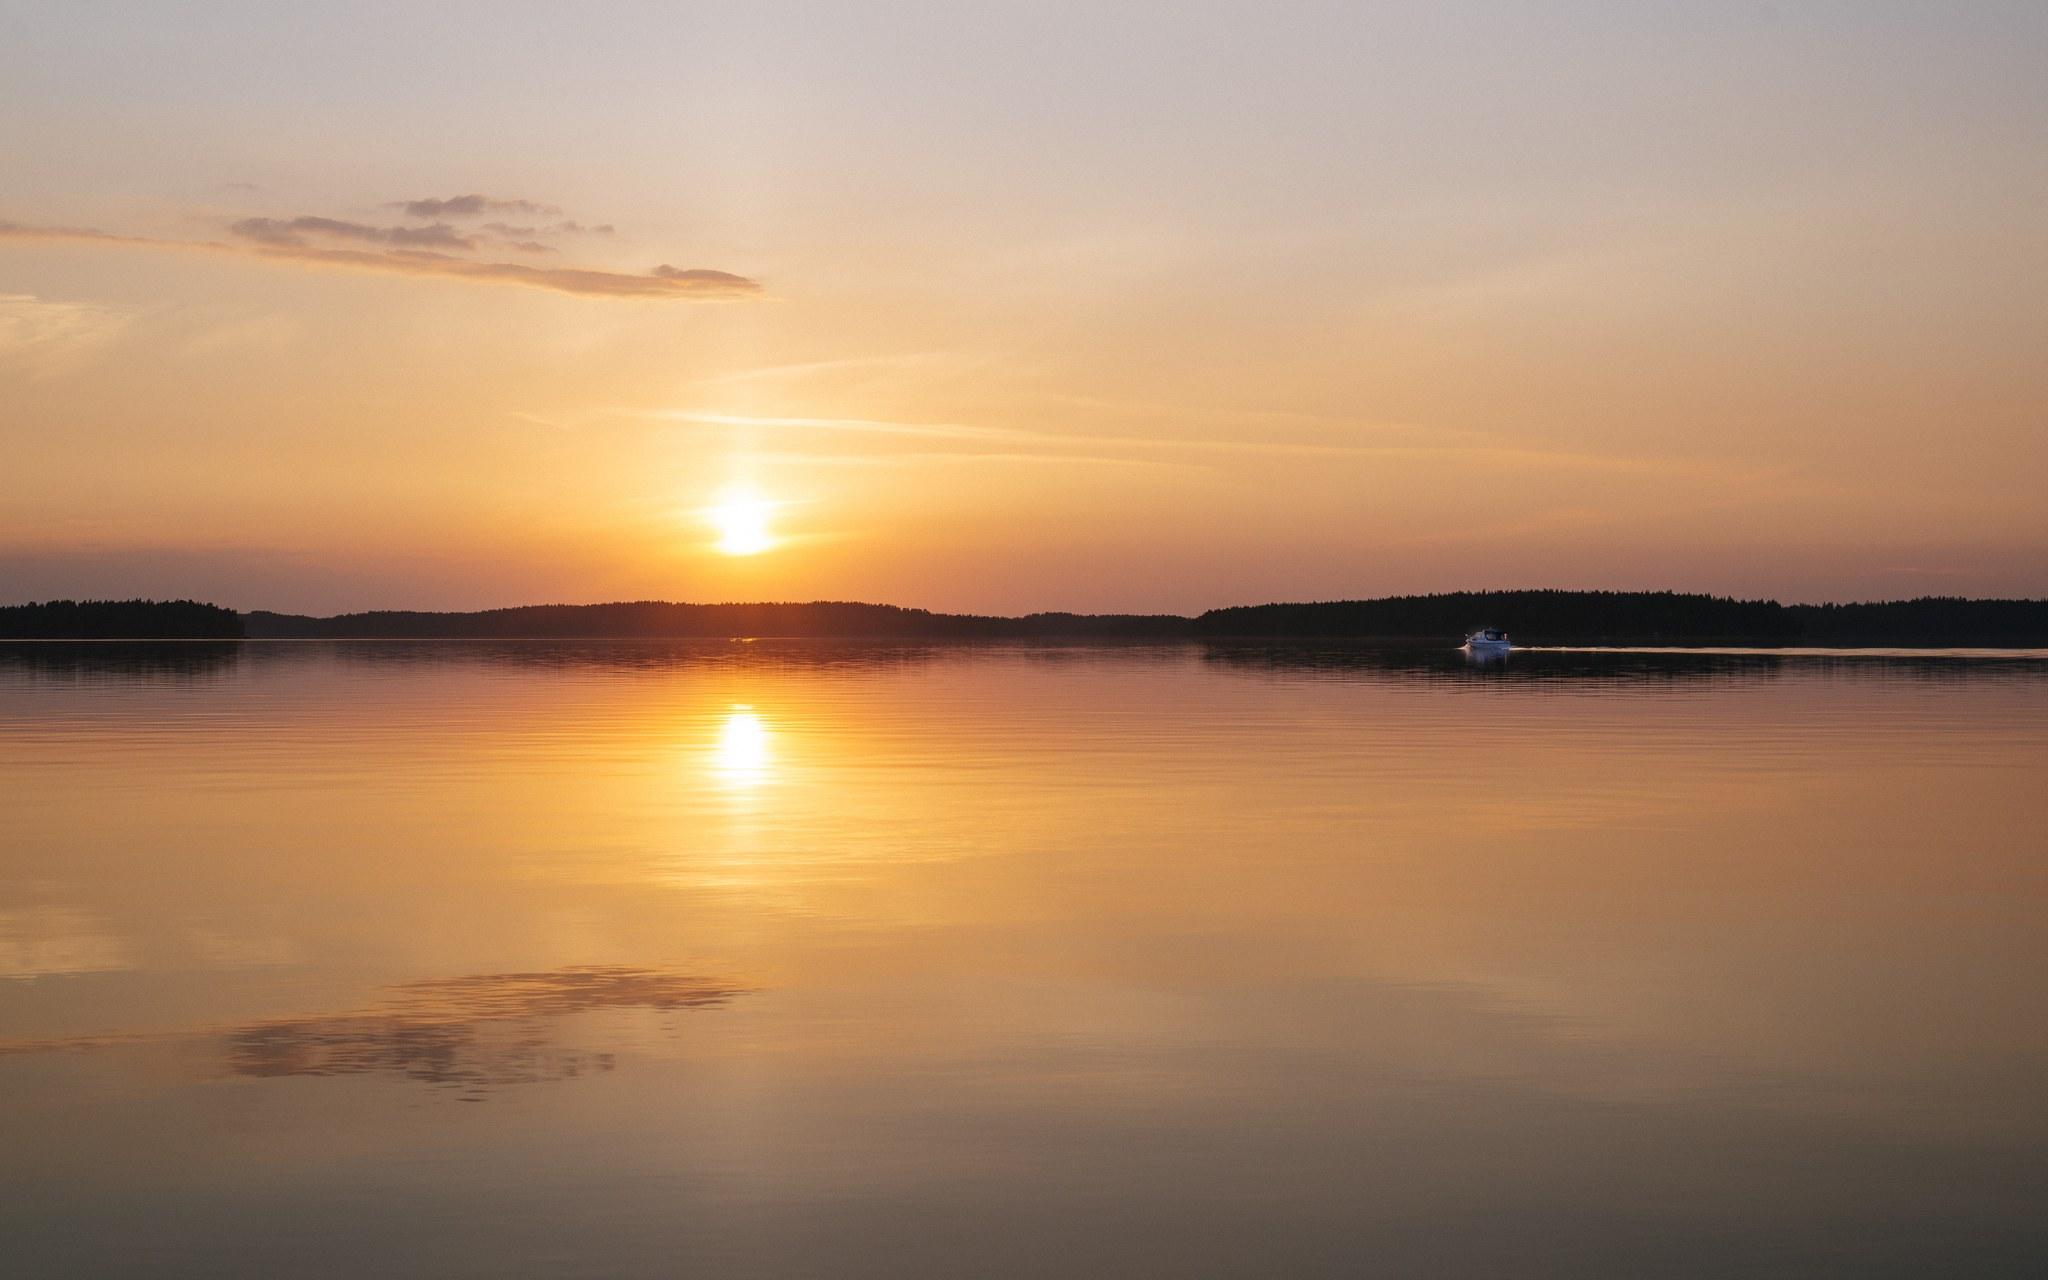 Kaunis auringonlasku Saimaalla